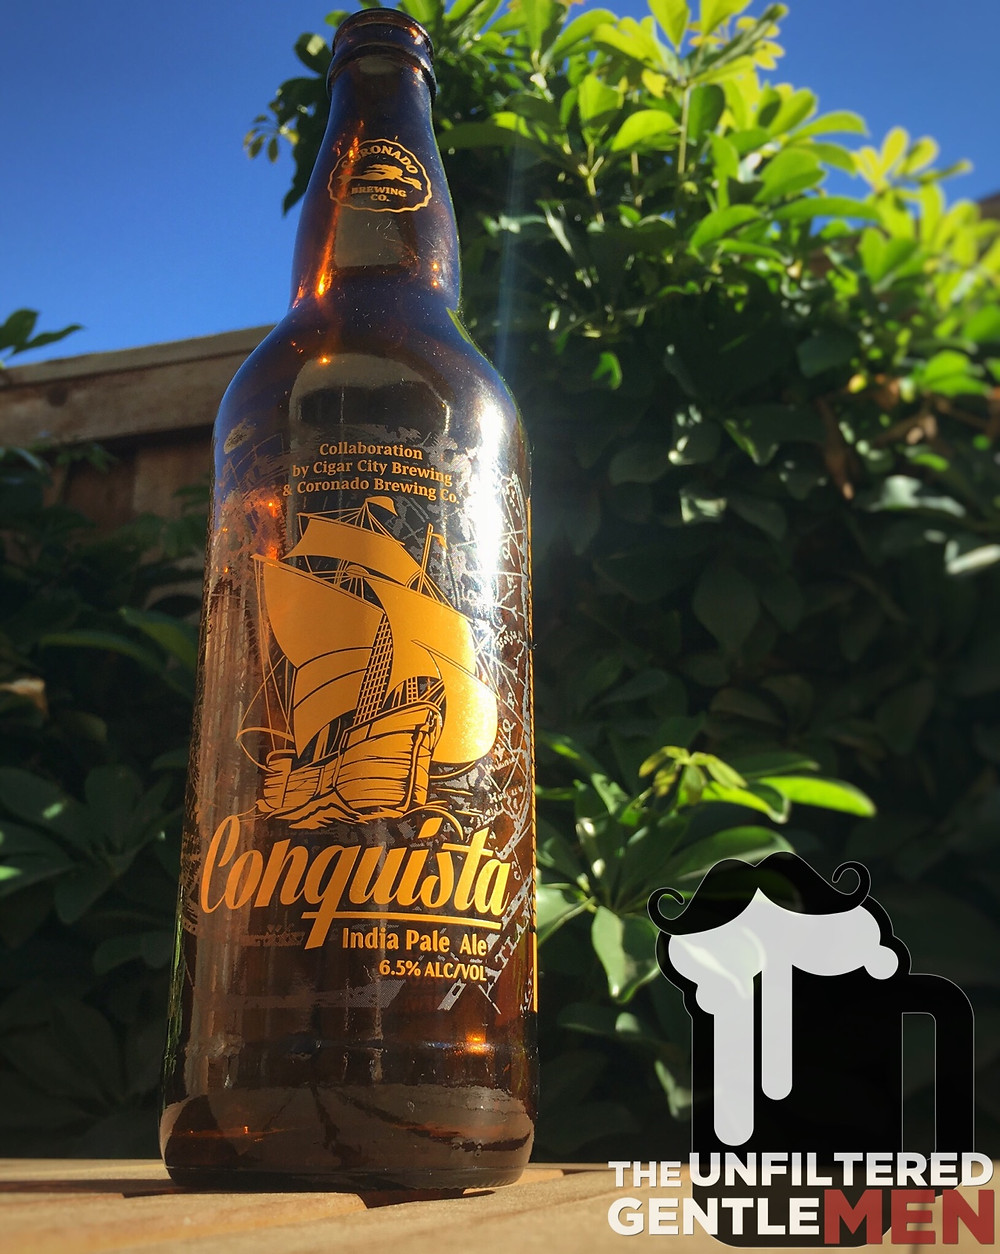 Cigar City Brewing & Coronado Brewing Conquista on The Unfiltered Gentlemen